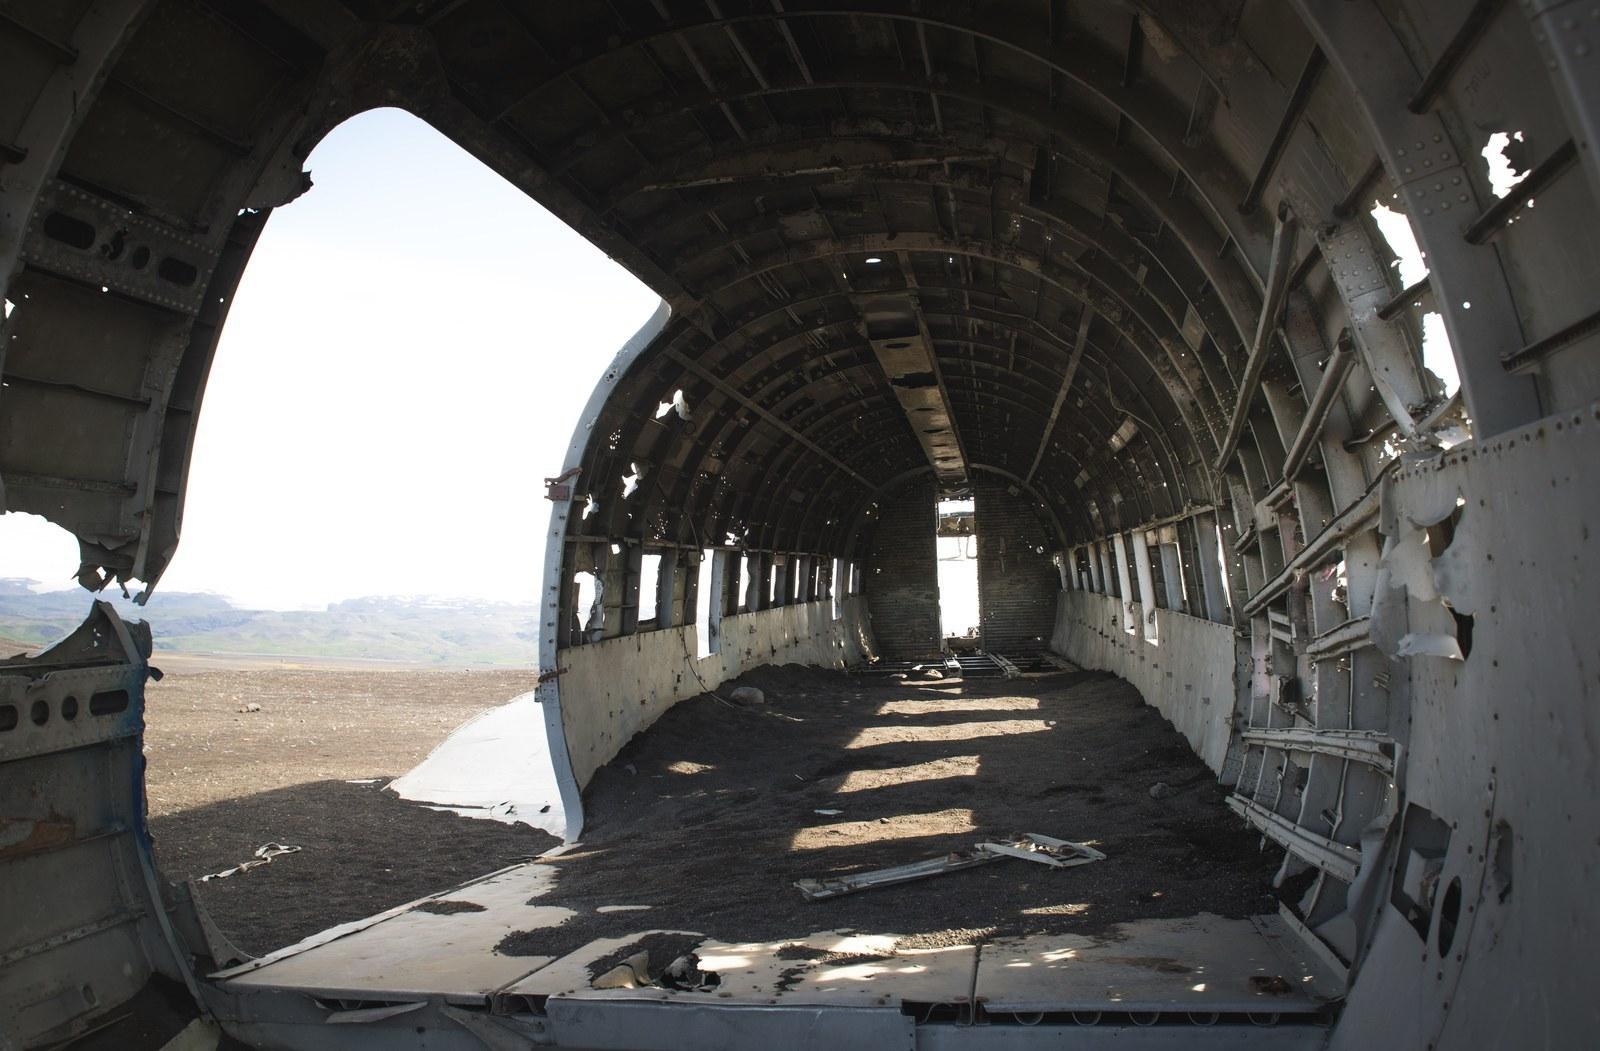 Intérieur de l'avion  Solheimasandur